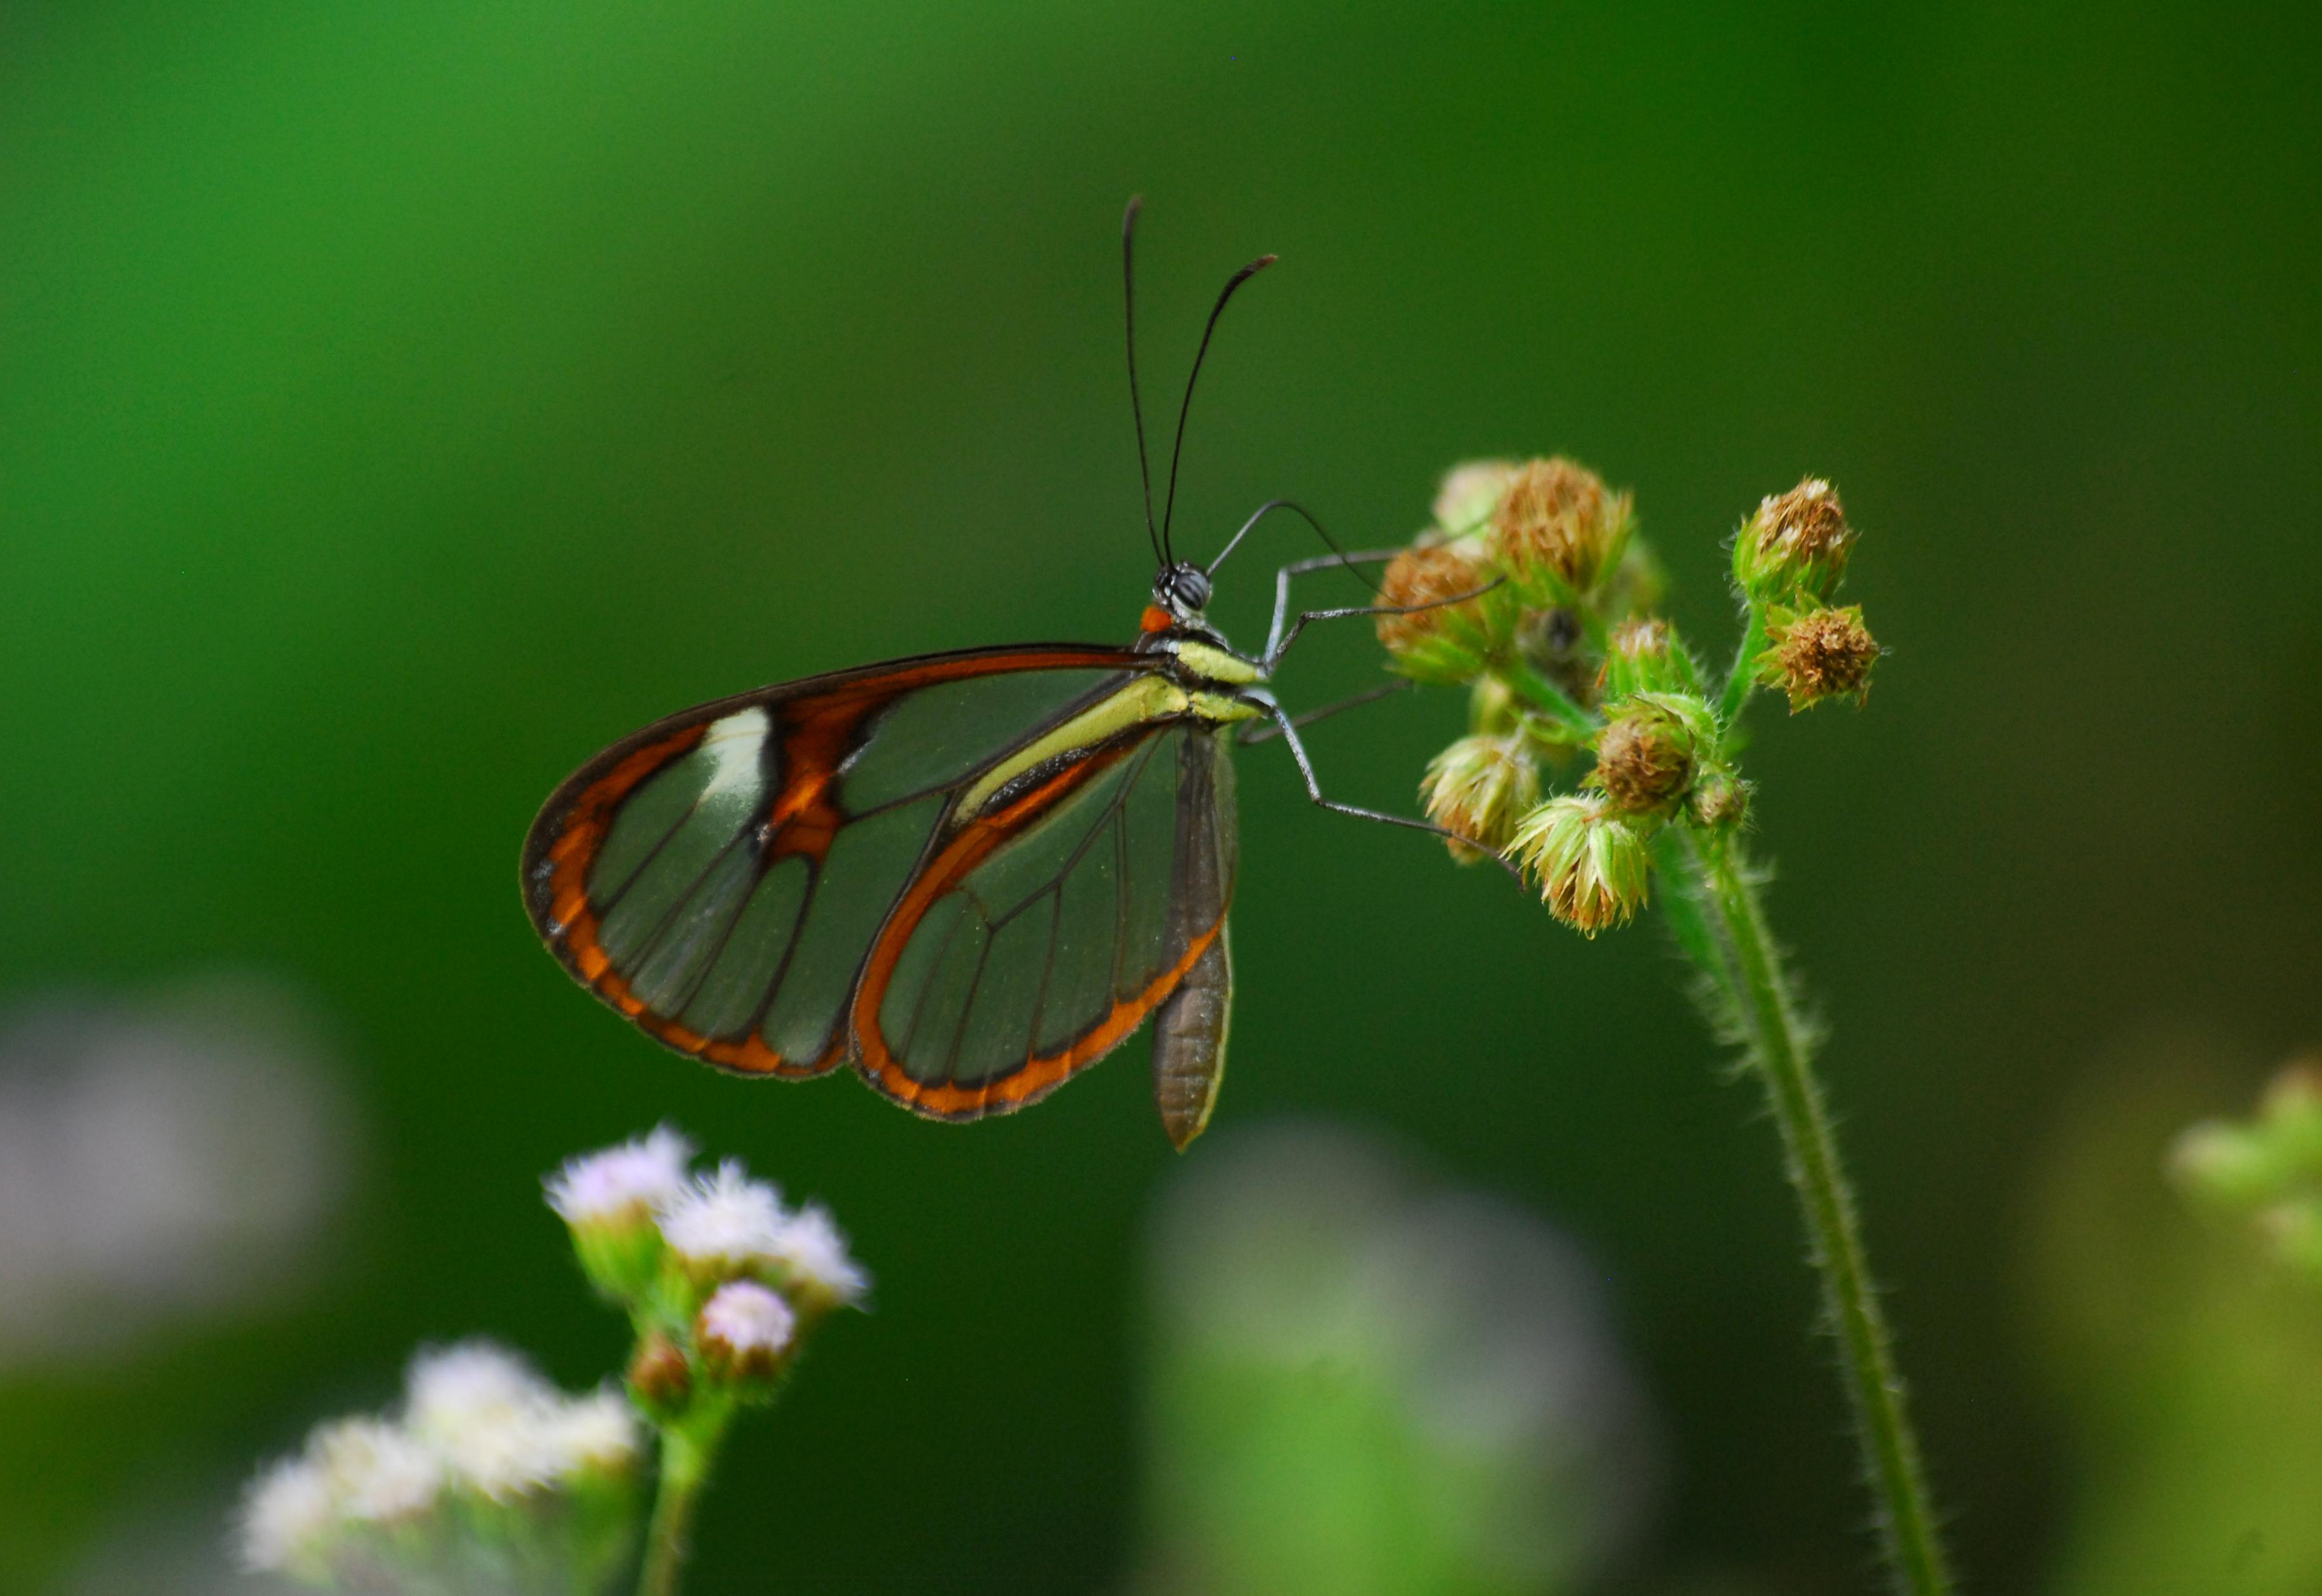 Mariposa Trasnparent Fede